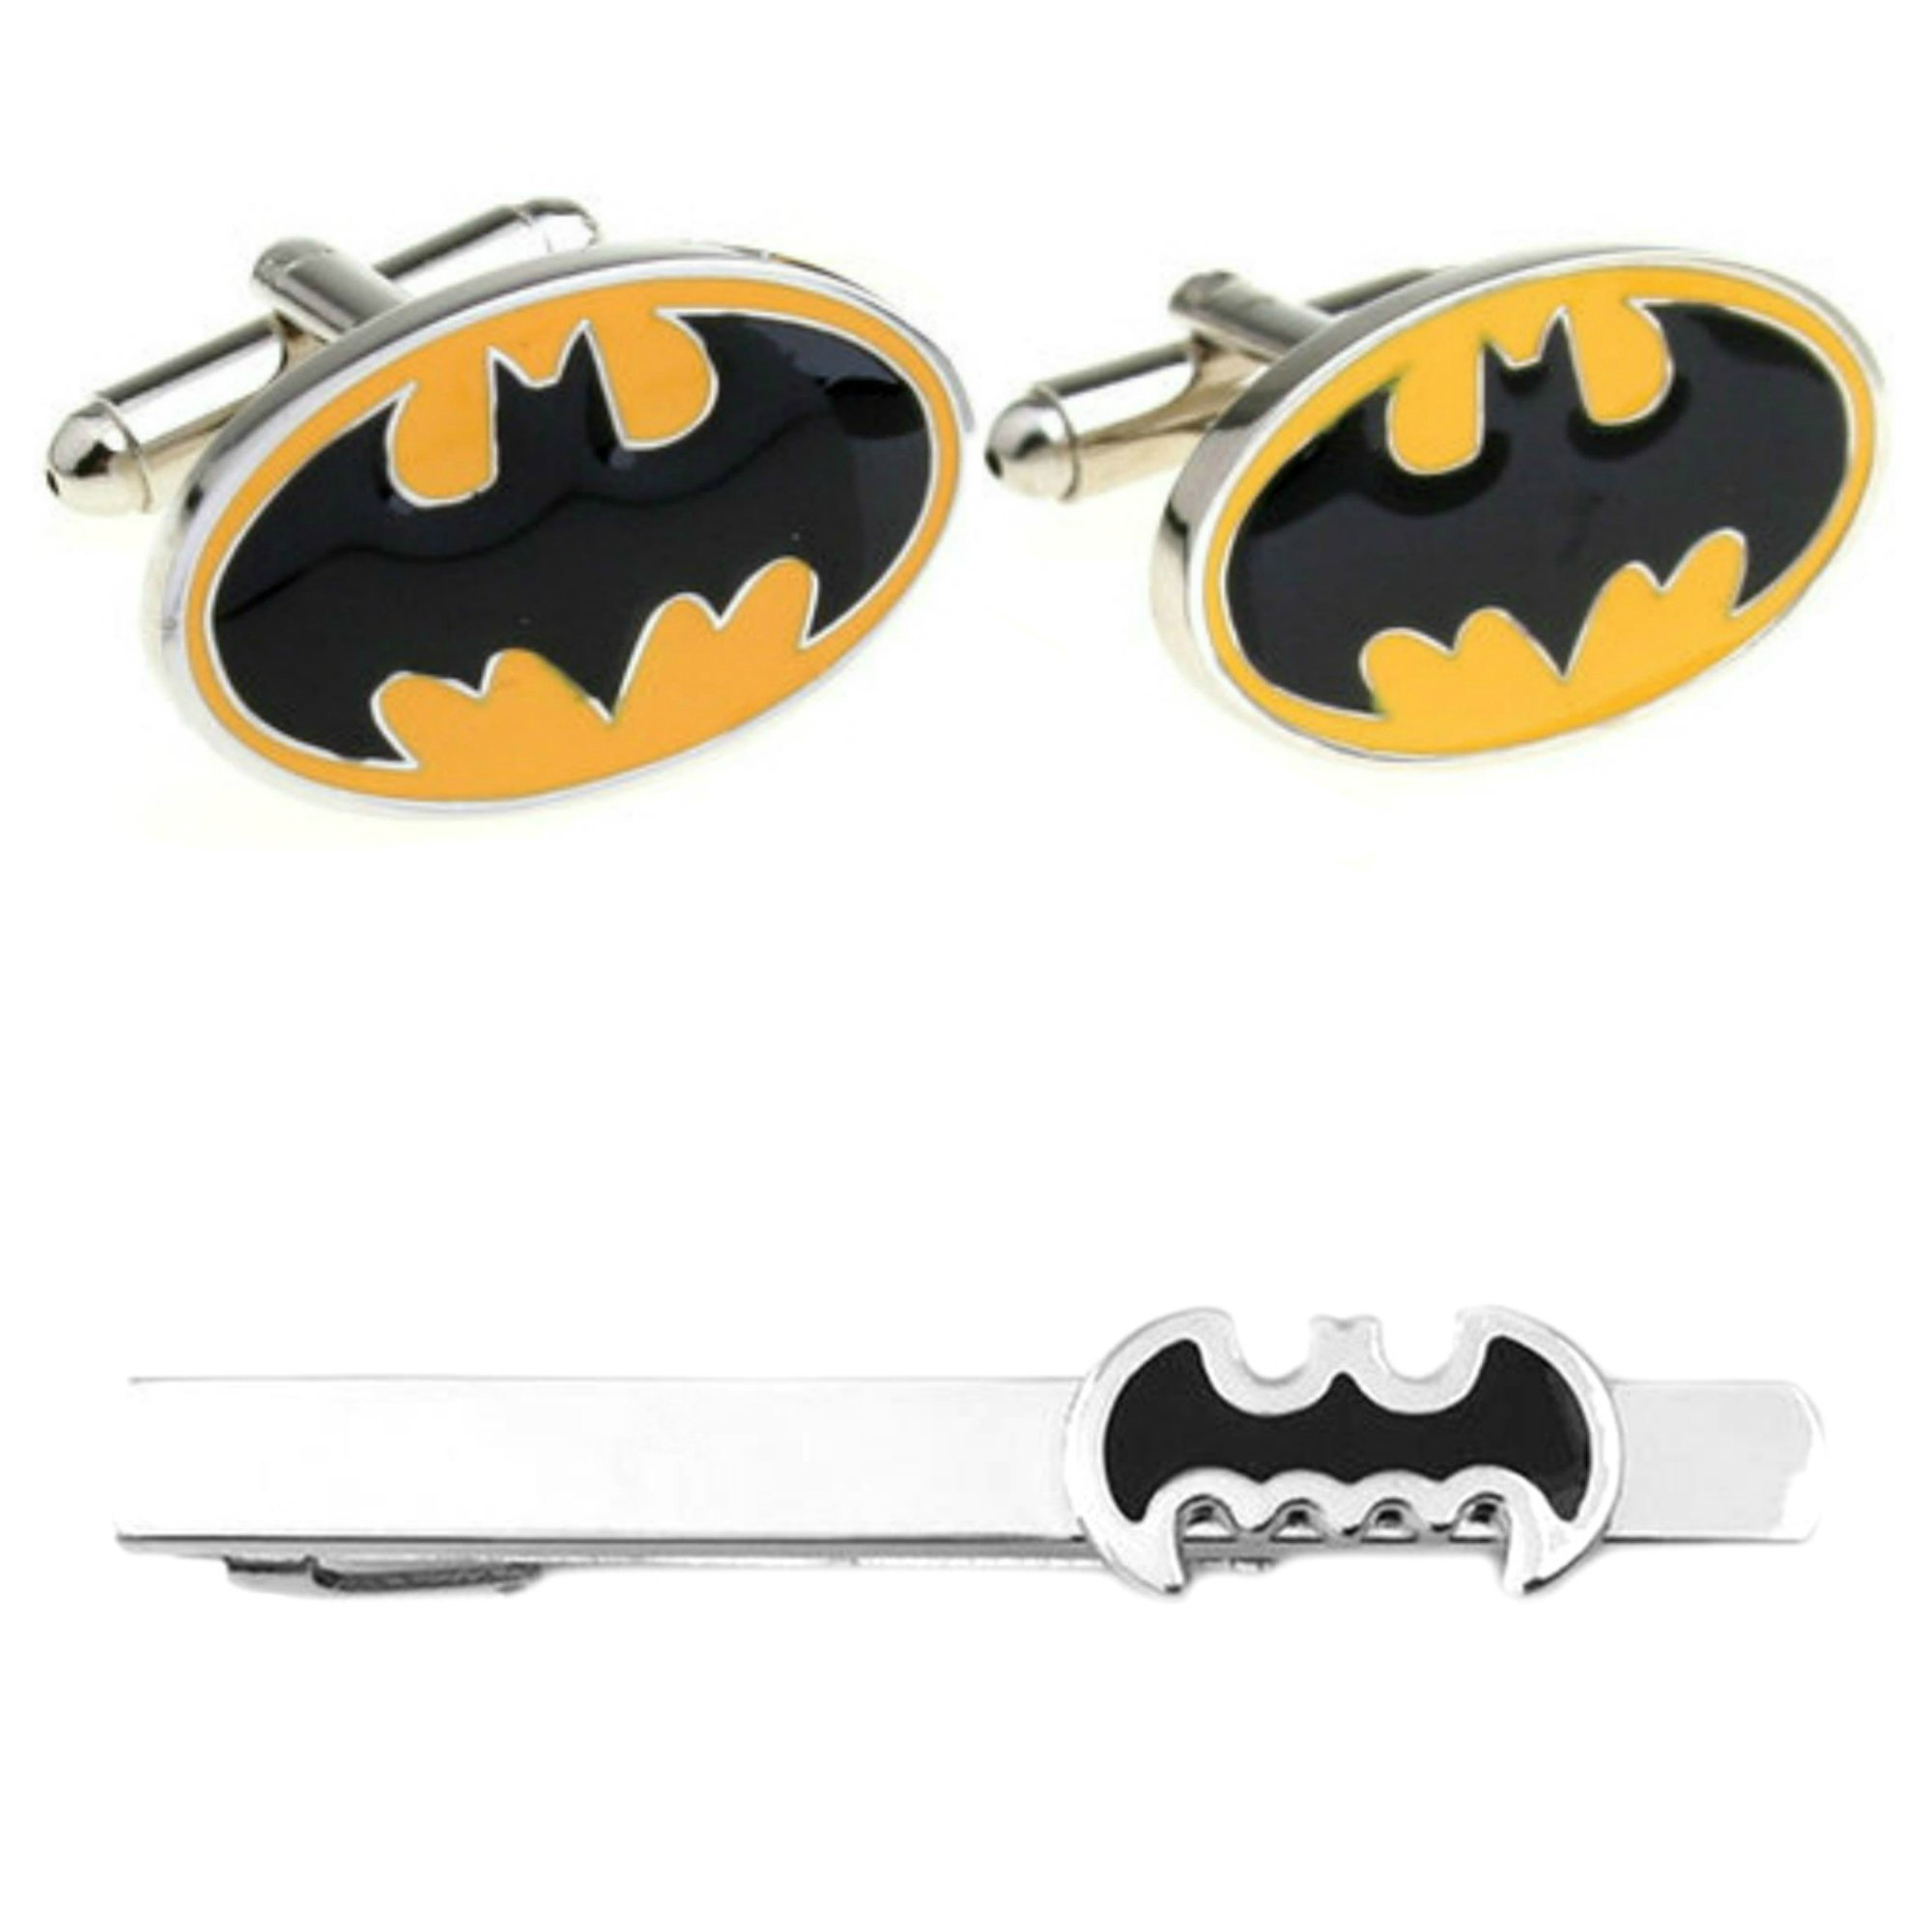 Outlander DC Comics - Batman Cufflink & Batman Cutout Tiebar - Set of 2 Wedding Superhero Logo w/Gift Box